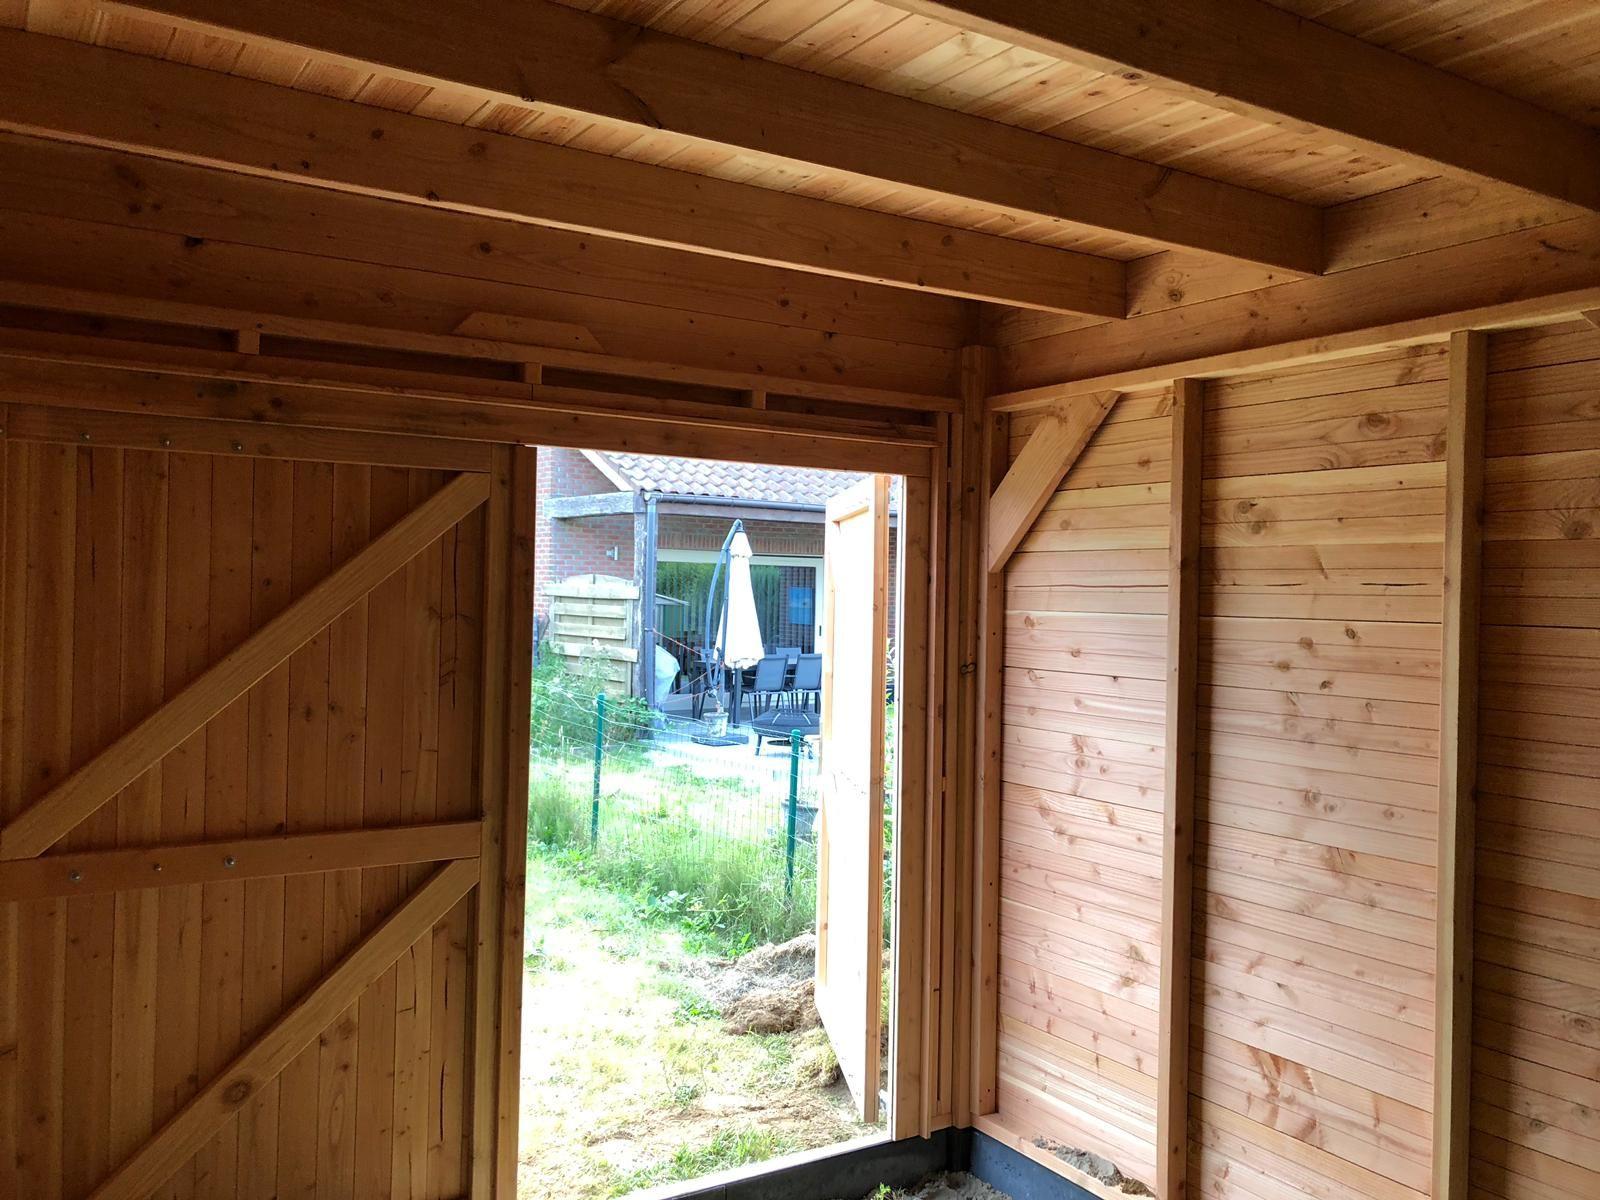 Carport van 505x350 cm in Wommelgem. Douglas hout, EPDM